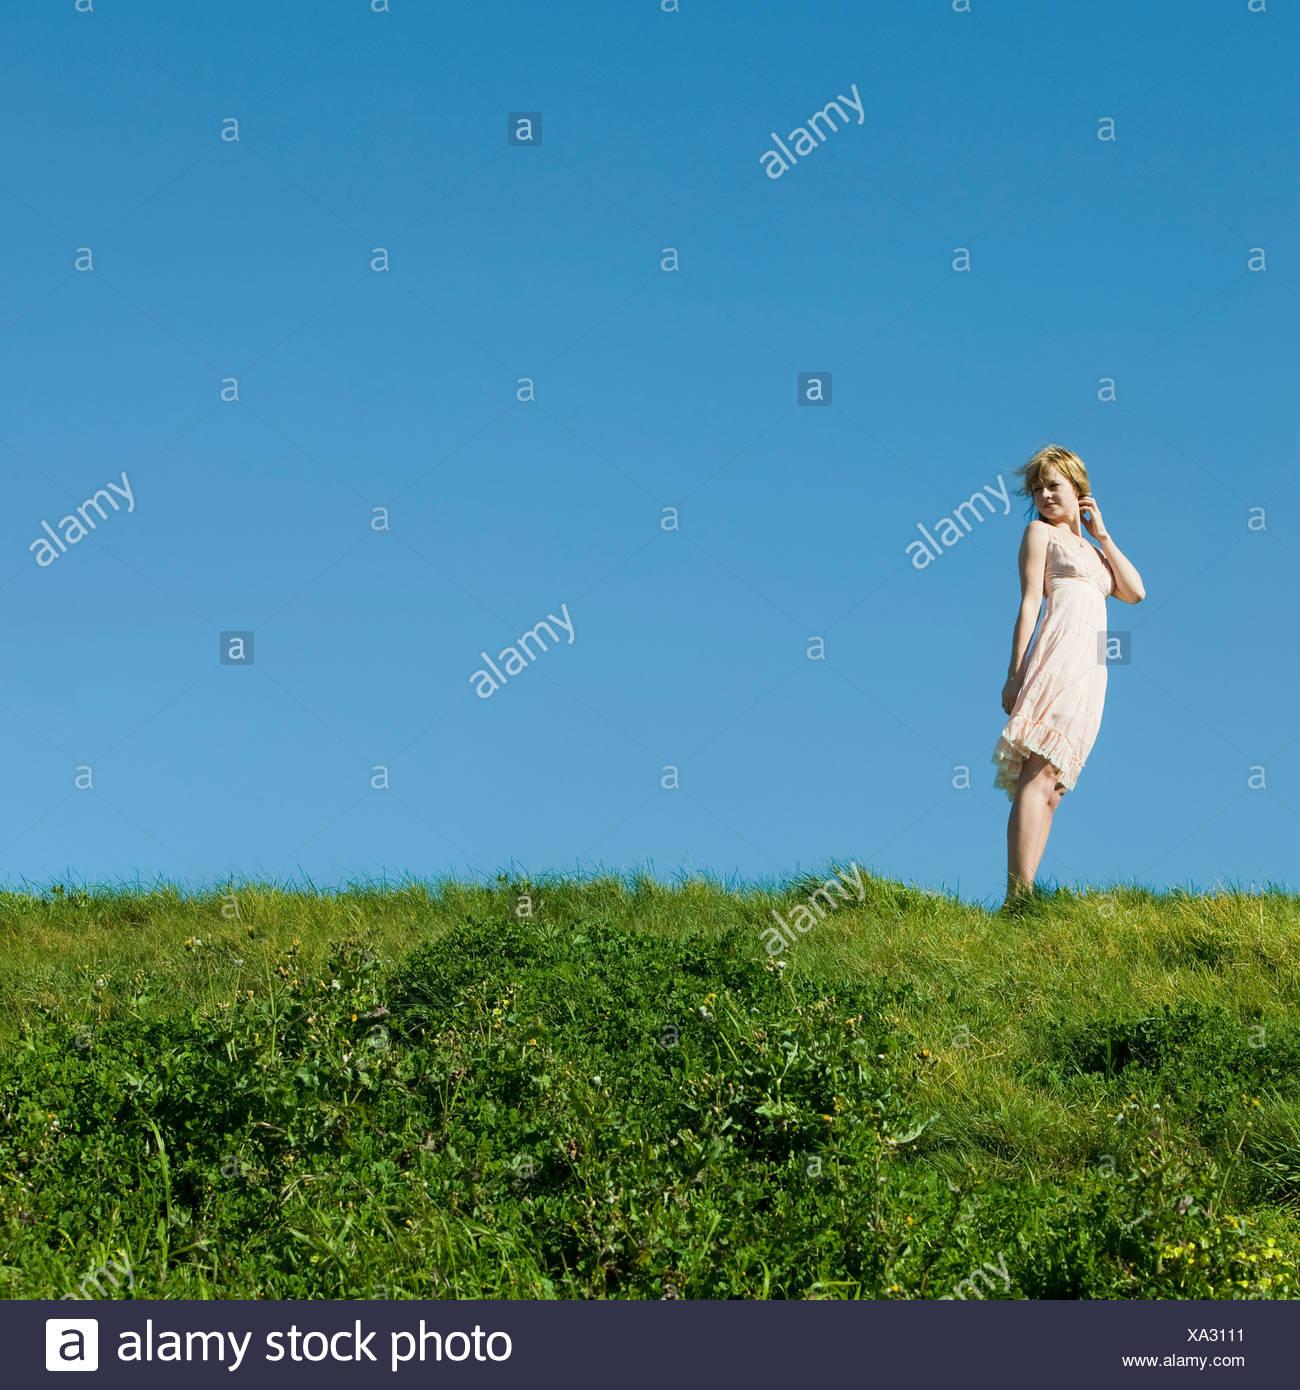 USA, Kalifornien, San Francisco, junge Frau auf dem Rasen Stockbild